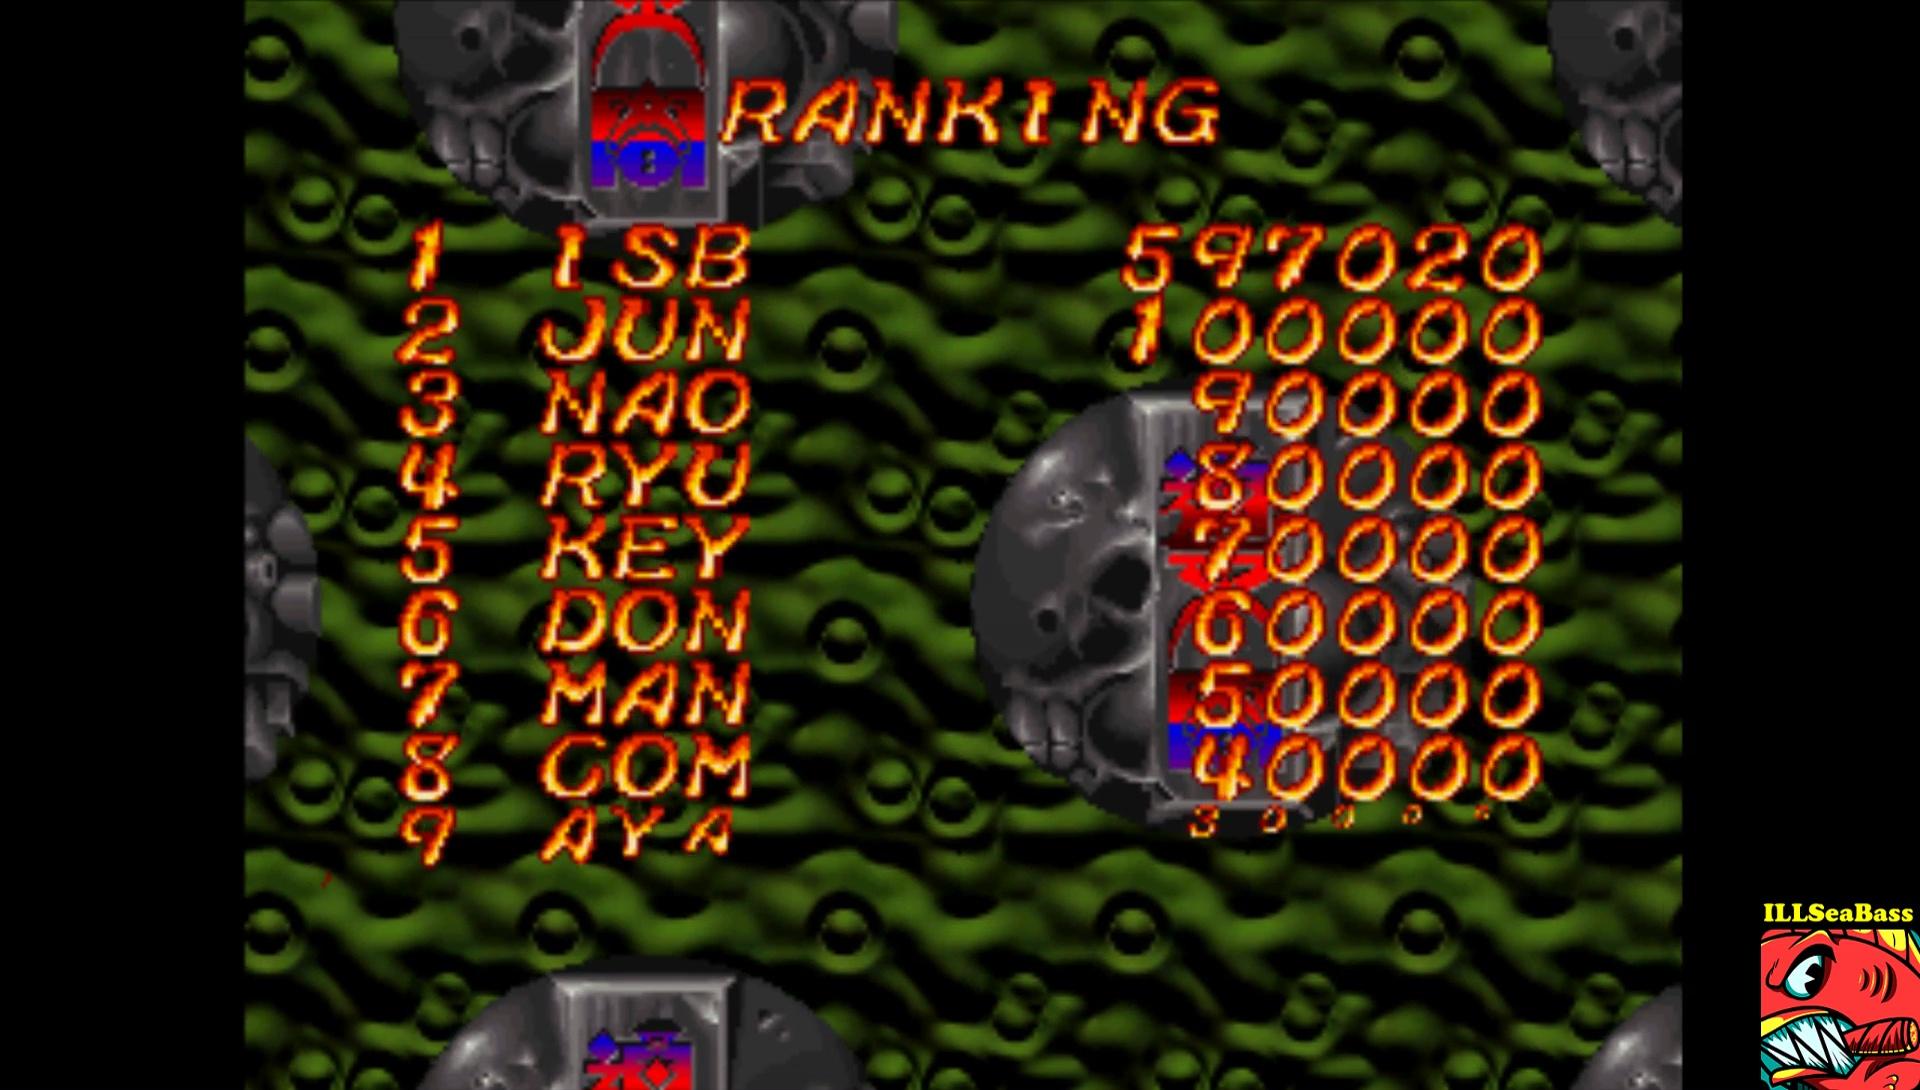 ILLSeaBass: Two-Tenkaku [easy] (Playstation 1 Emulated) 597,020 points on 2017-02-16 23:27:17